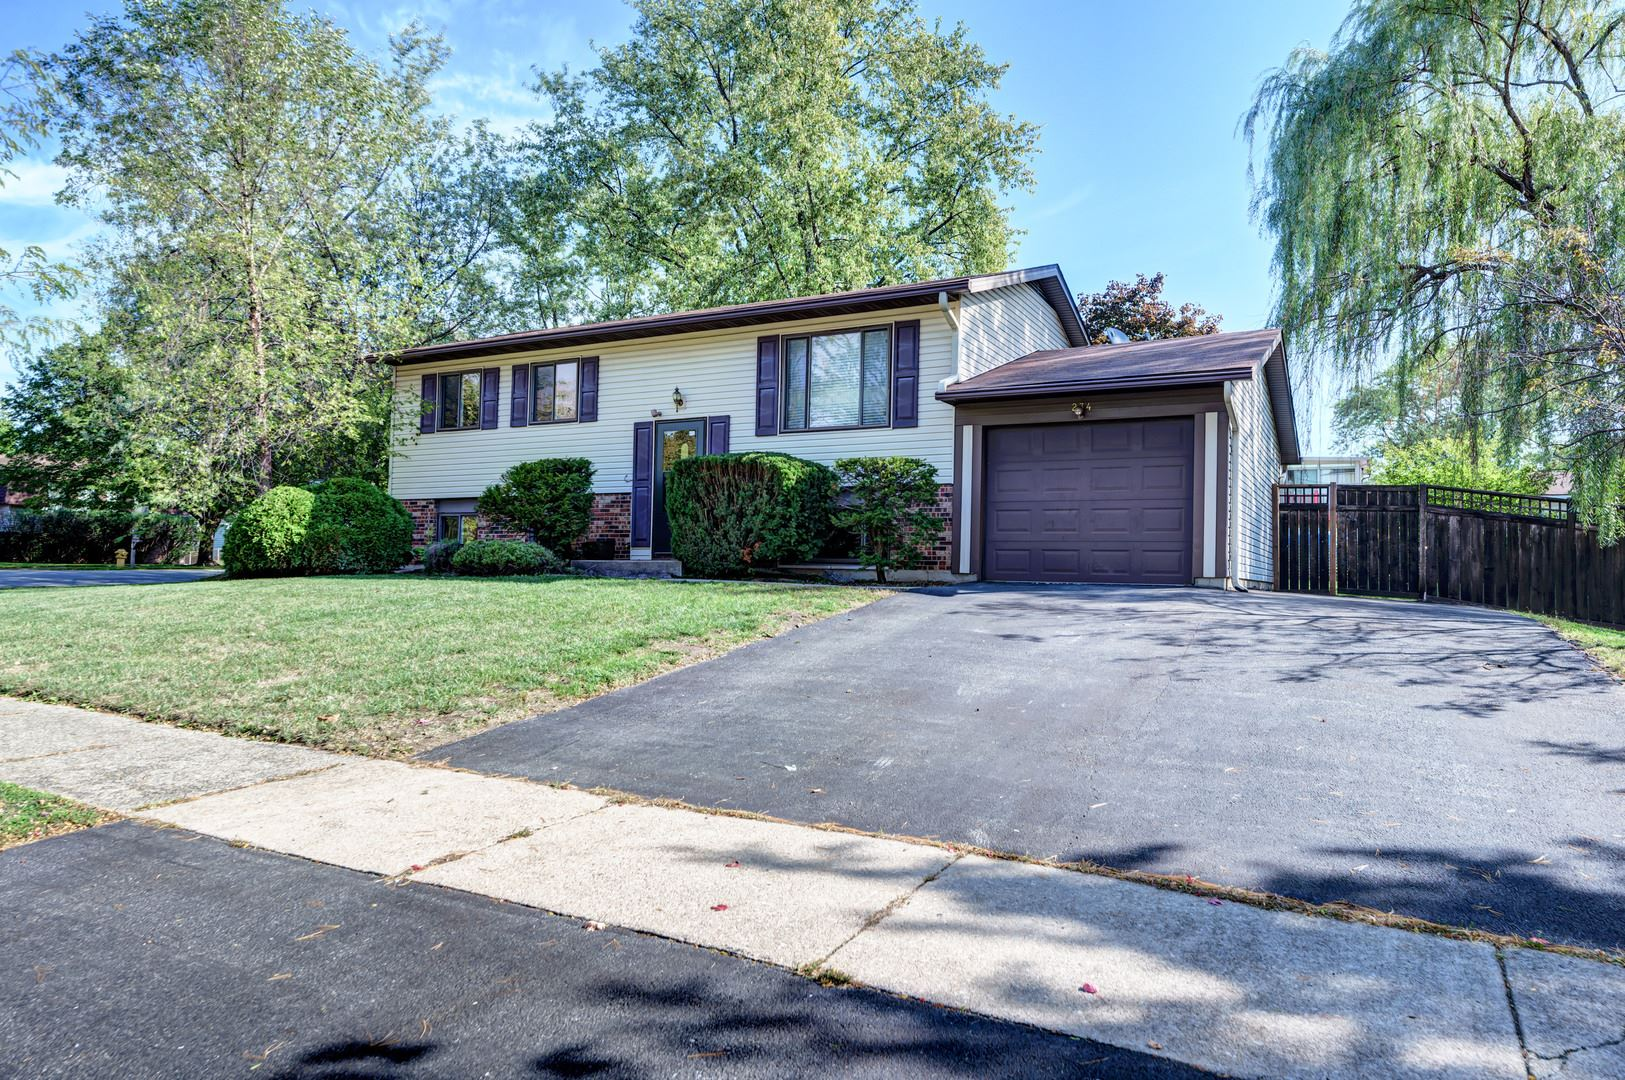 Photo of 234 Bedford Road, Bolingbrook, IL 60440 (MLS # 10894612)